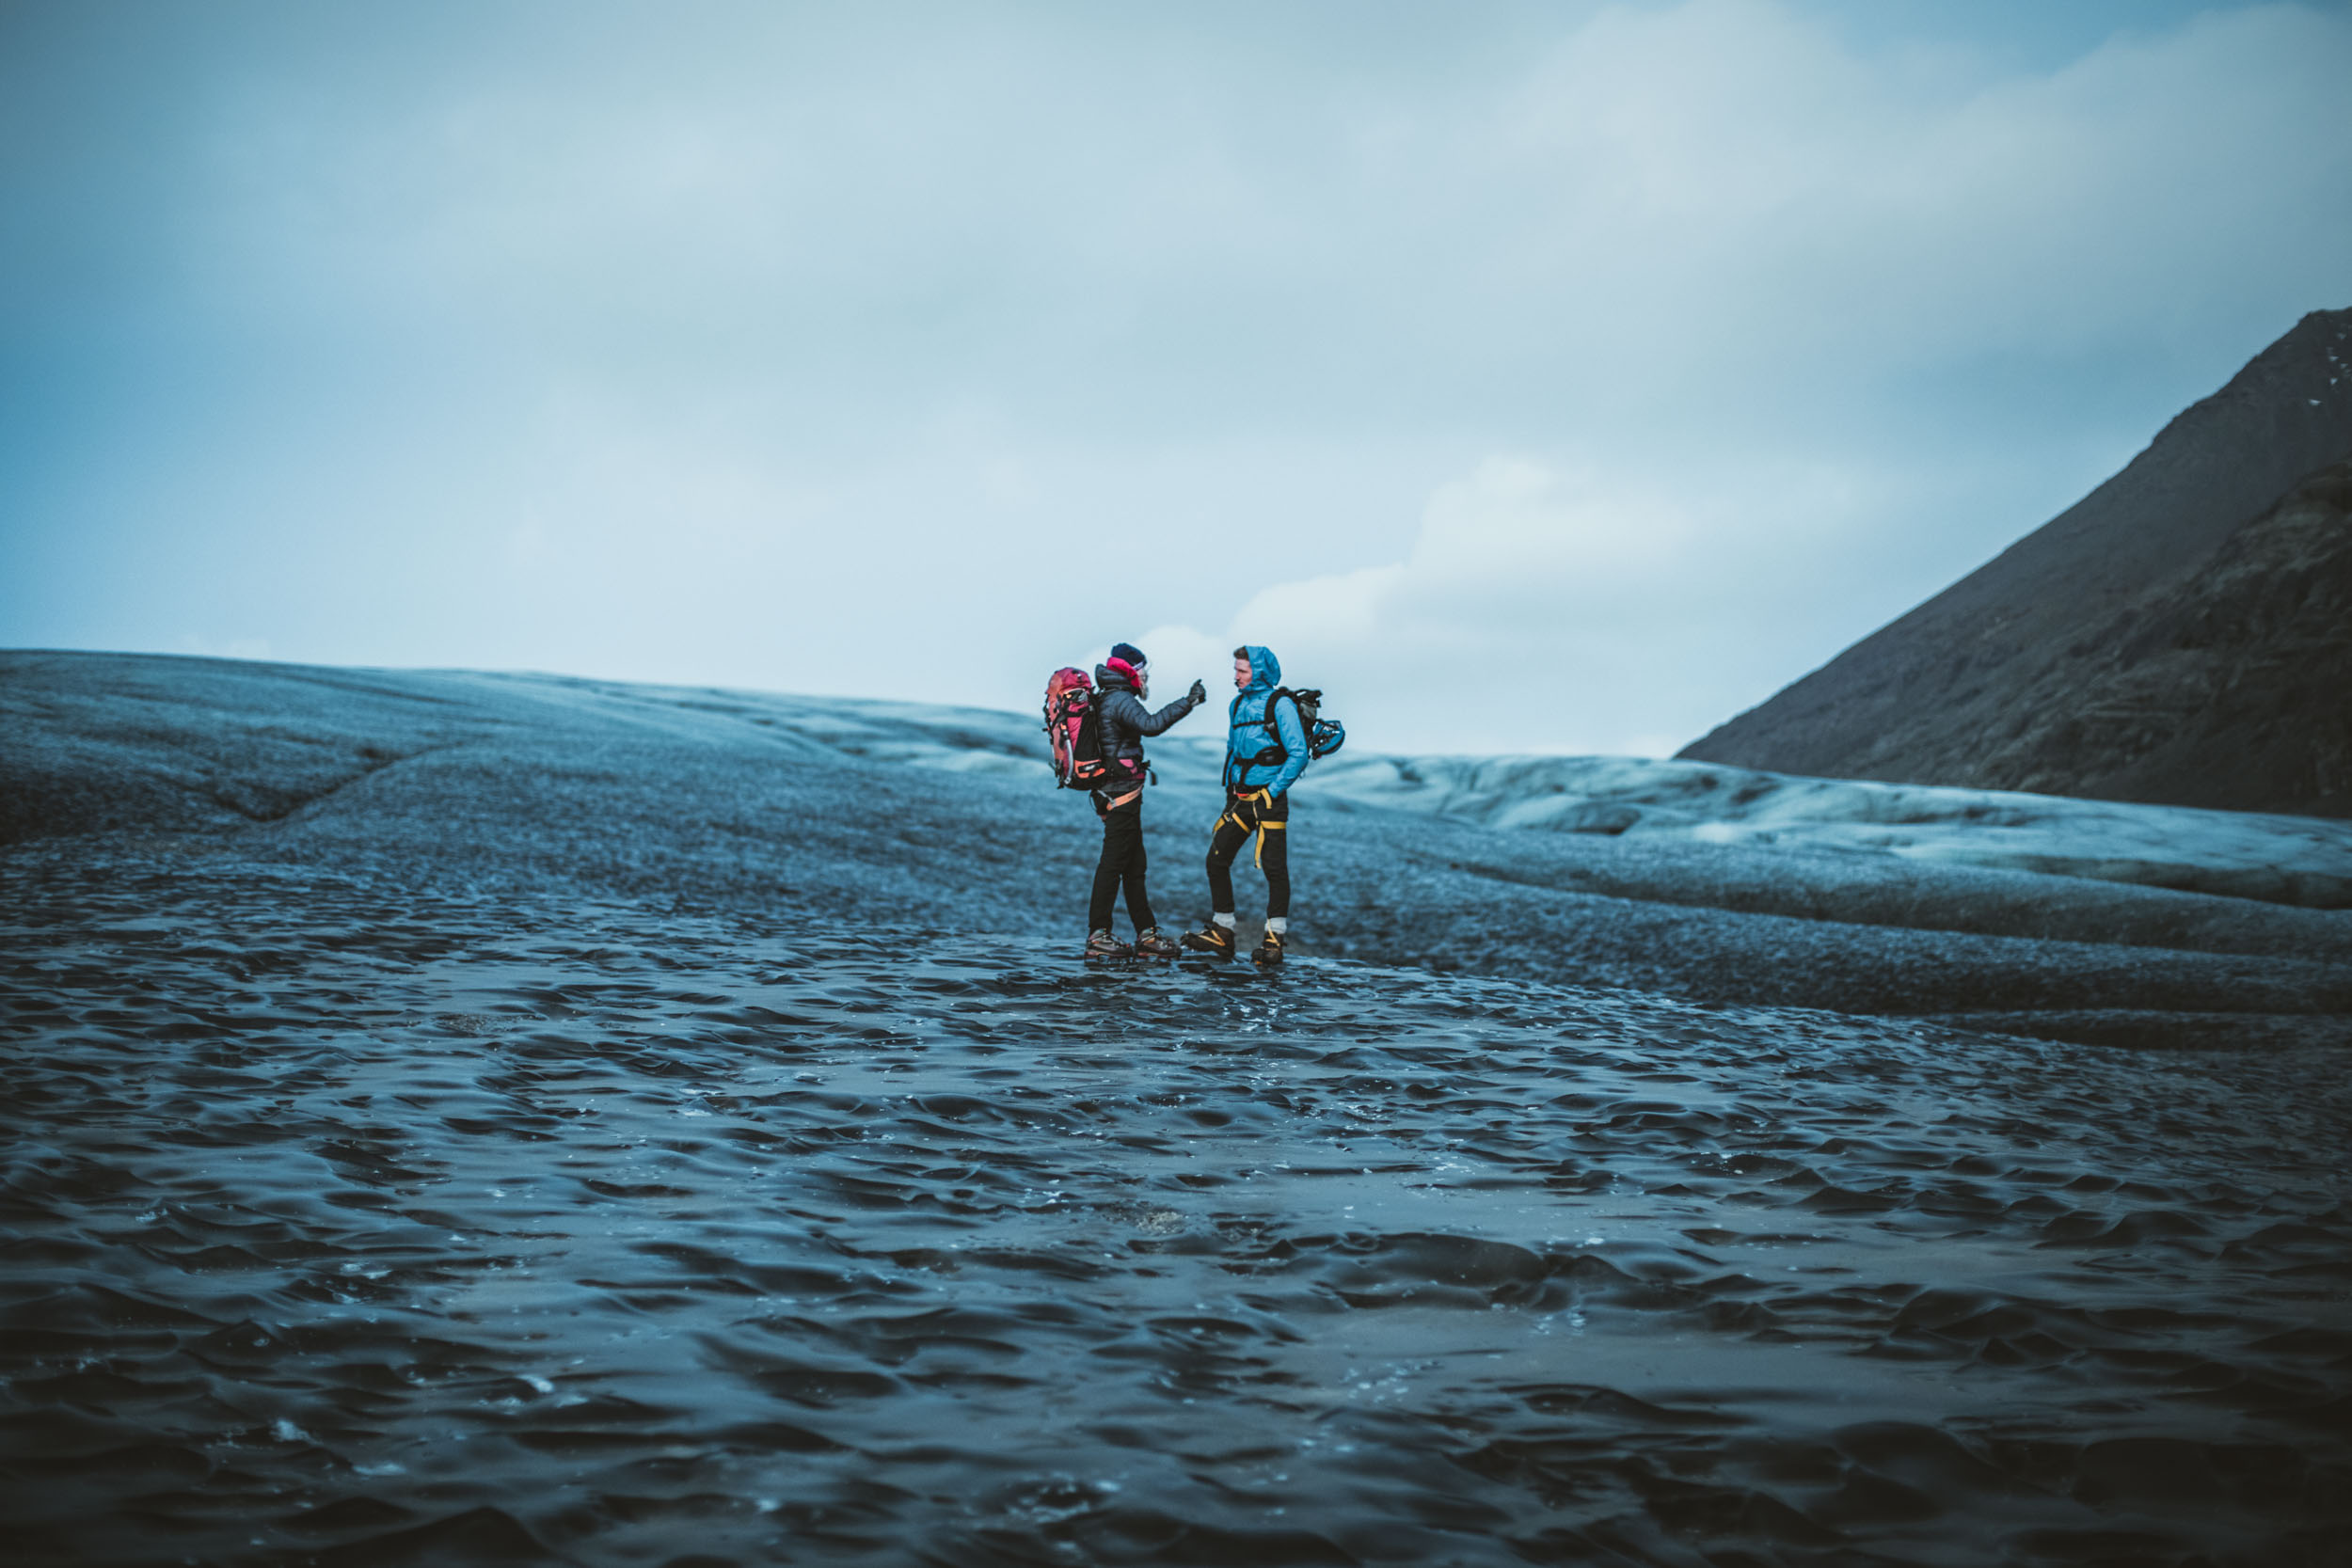 Iceland_Jan_2019_ByTomKahler_Lowres (153 of 262).jpg